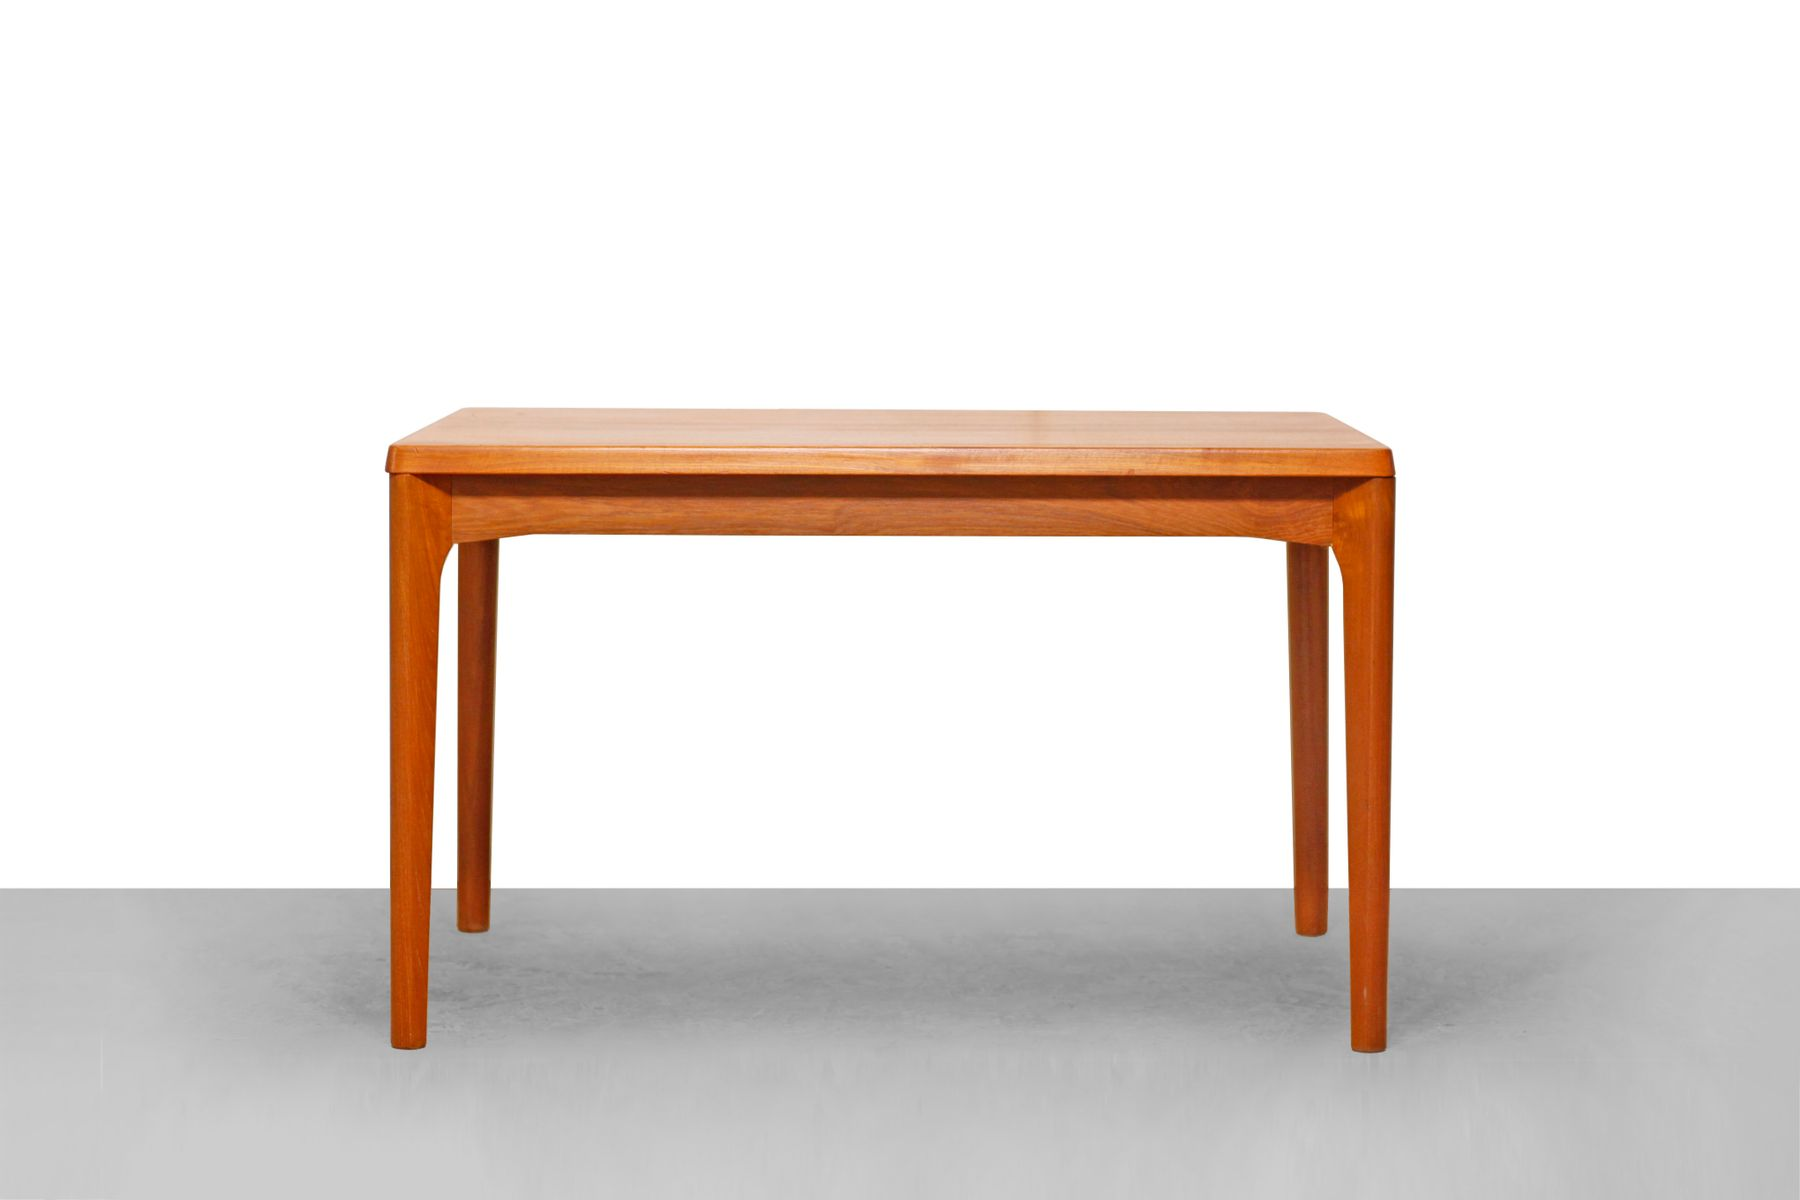 Danish Modern Teak Dining Table by Henning Kj230rnulf for  : danish modern teak dining table by henning kjaernulf for vejle 1960s 1 from www.pamono.com size 1800 x 1200 jpeg 51kB